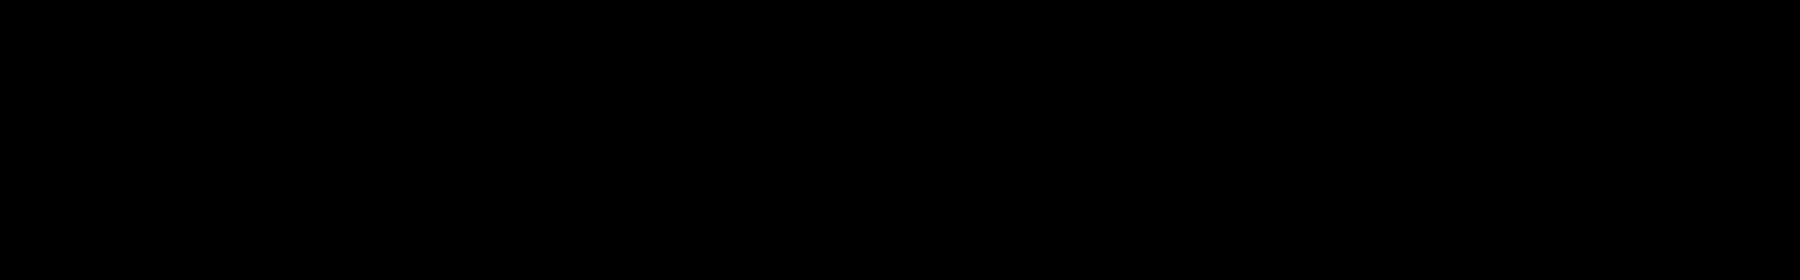 Trappin Astro audio waveform